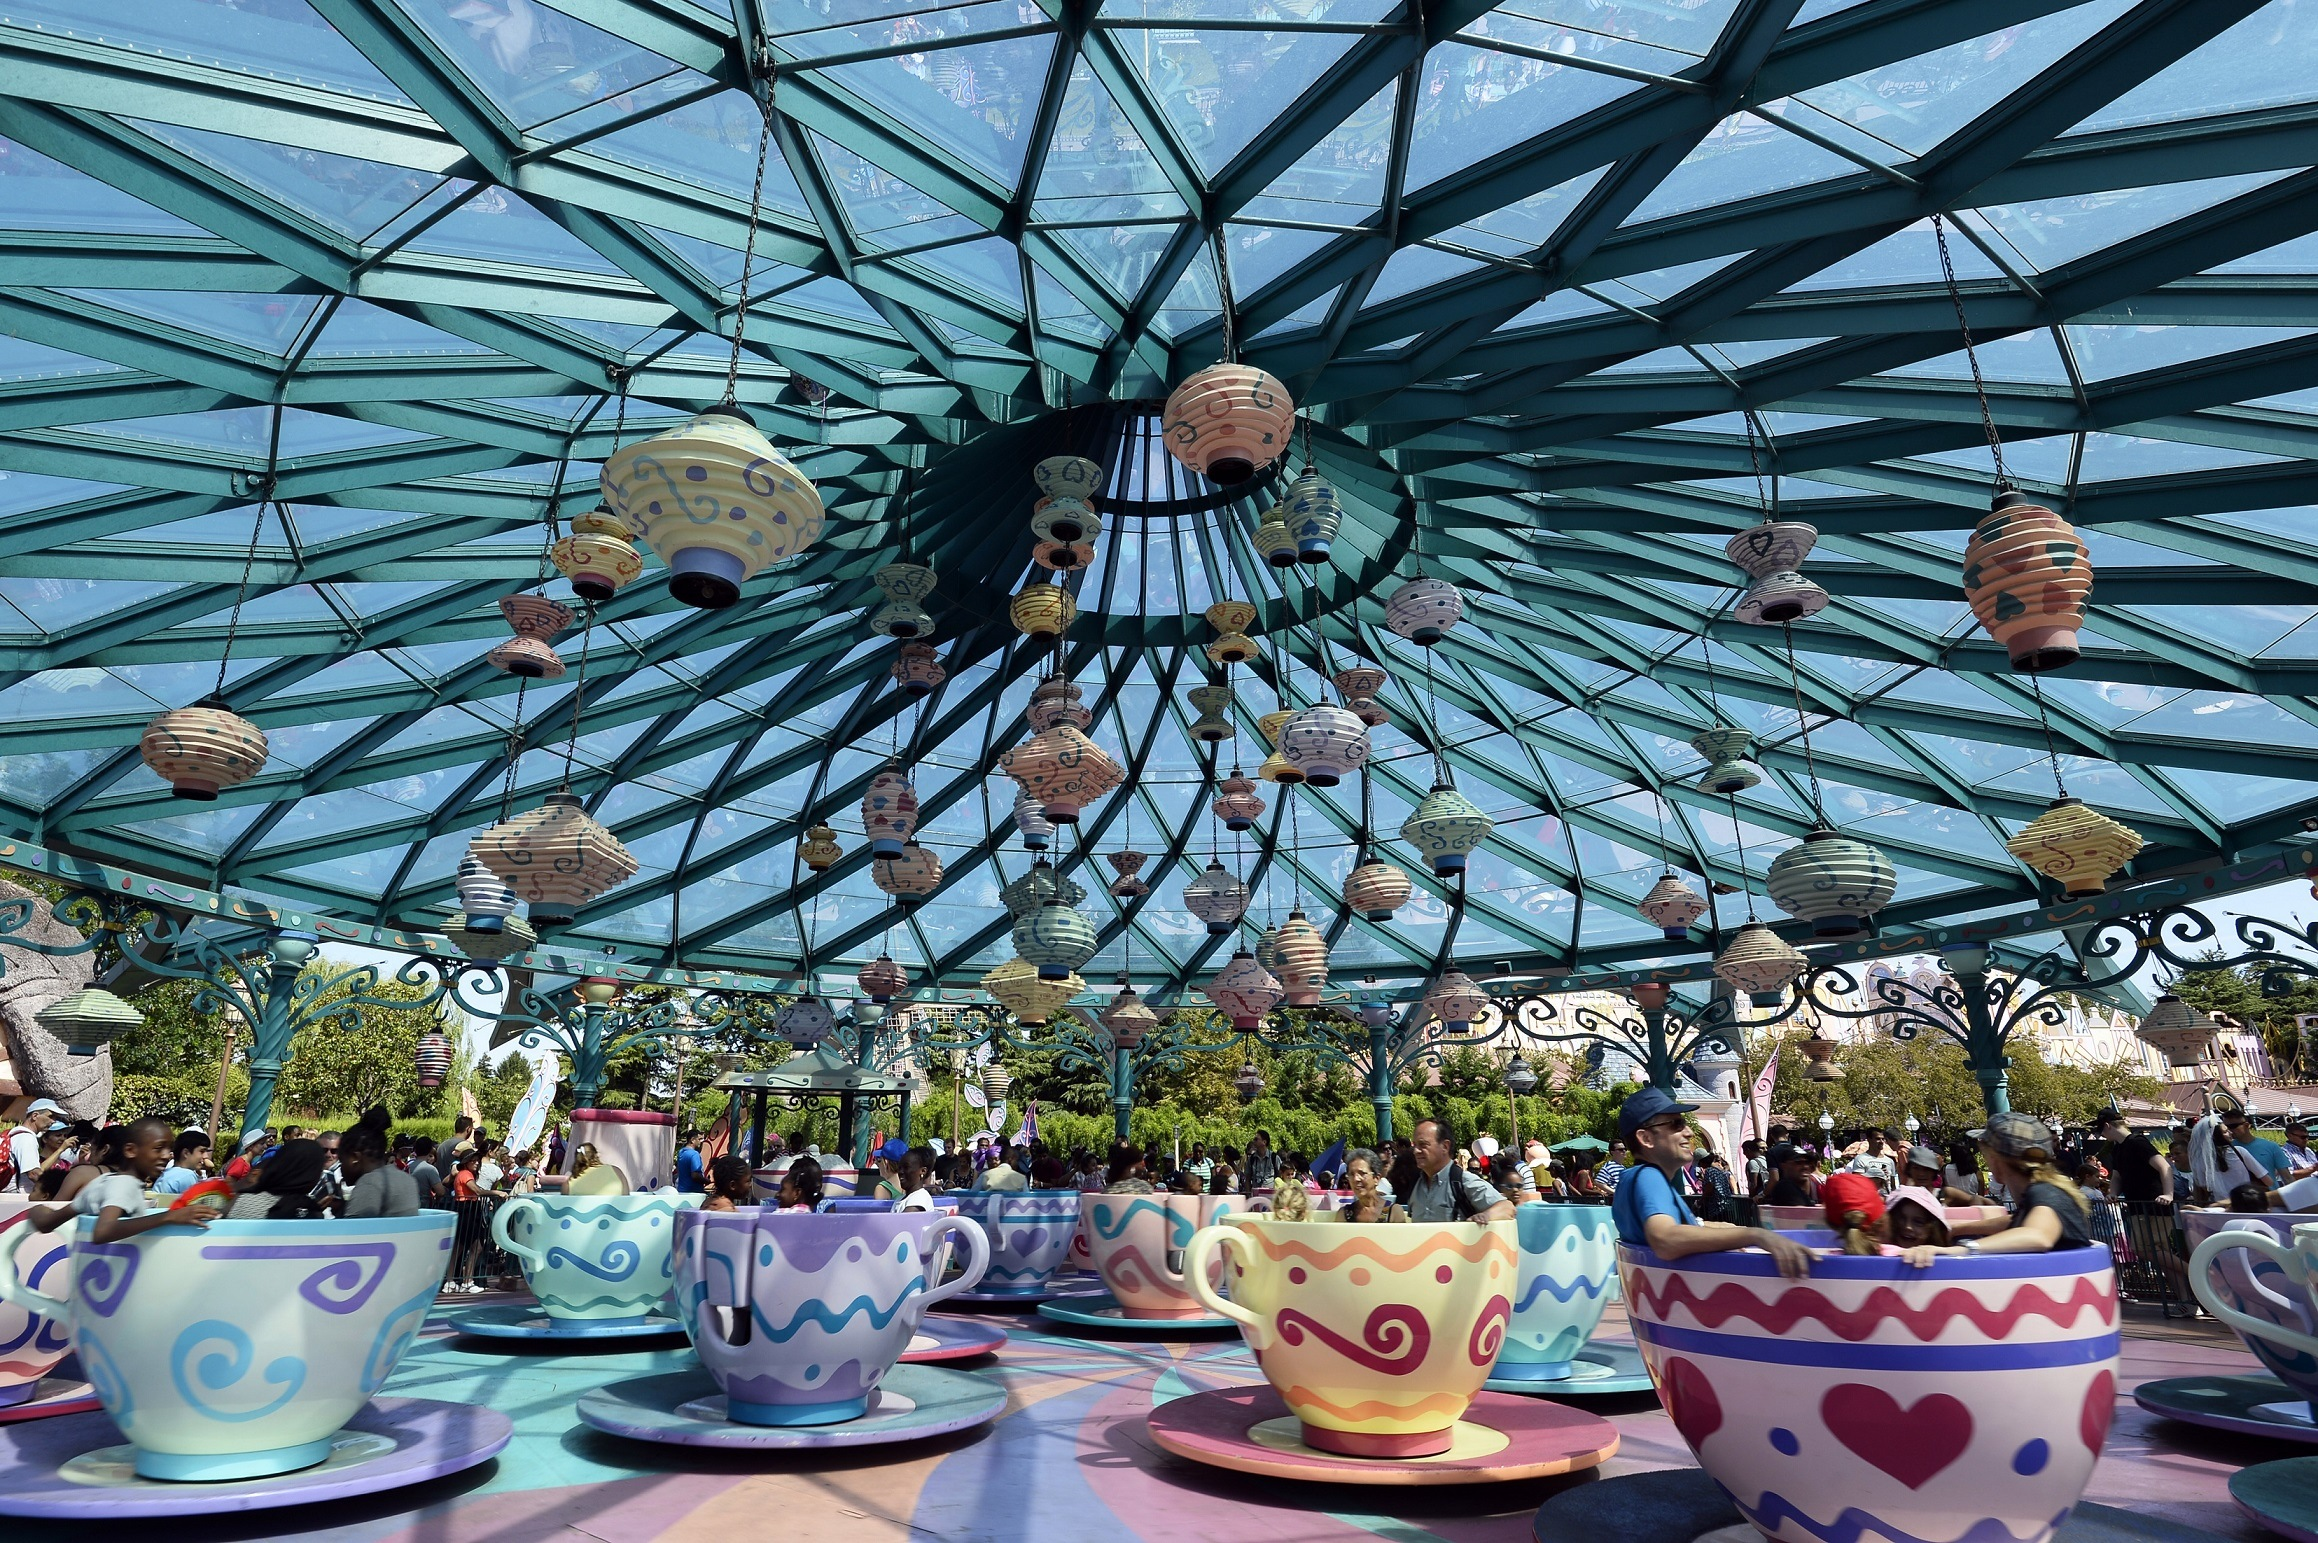 Spinning Teacups at Disney Paris